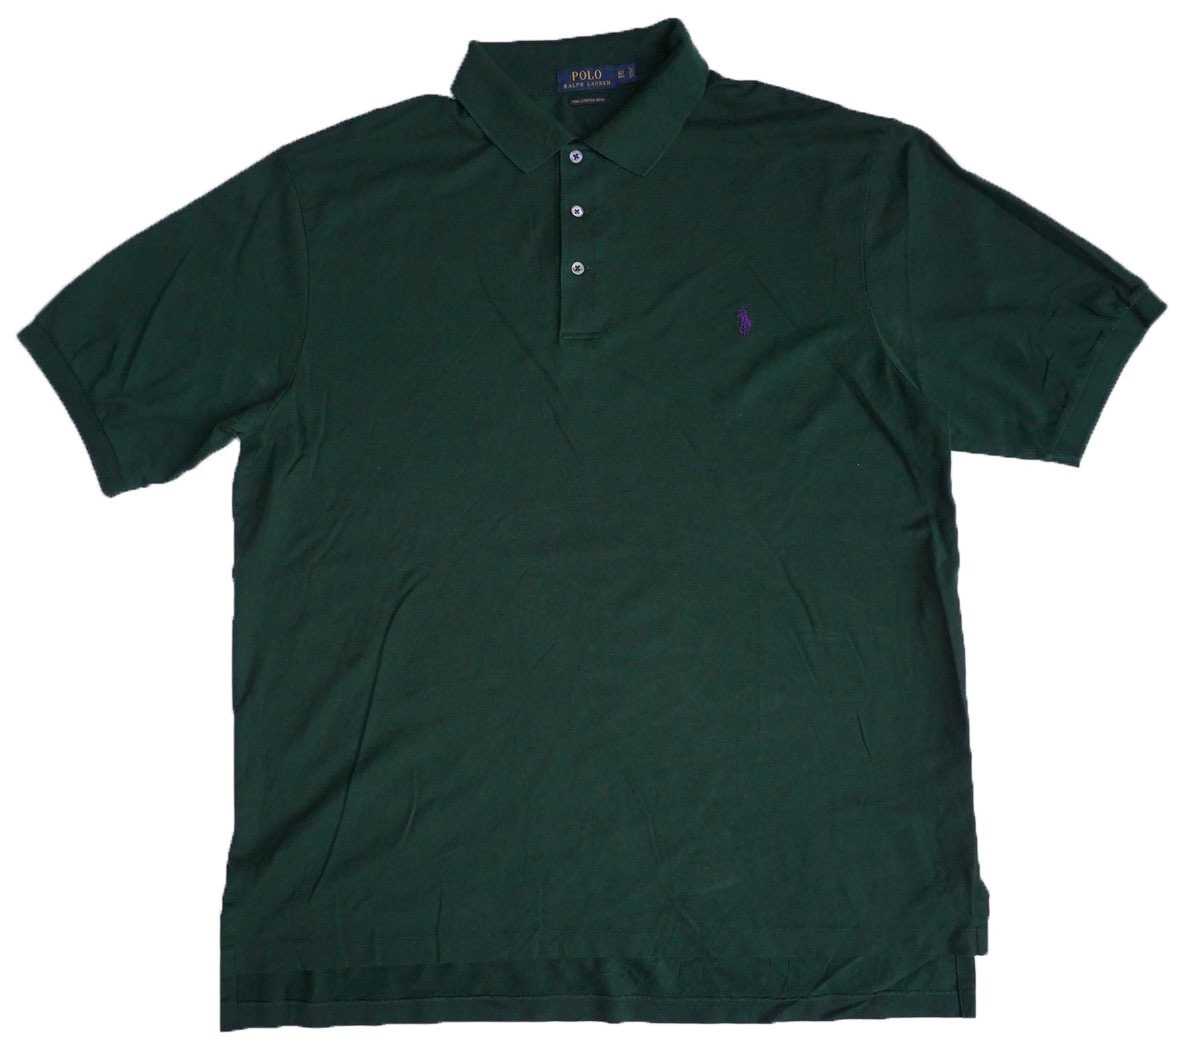 a24177084 ... wholesale polo ralph lauren talla xl original xlt pima cotton. cargando  zoom. 10c6b 93ebe